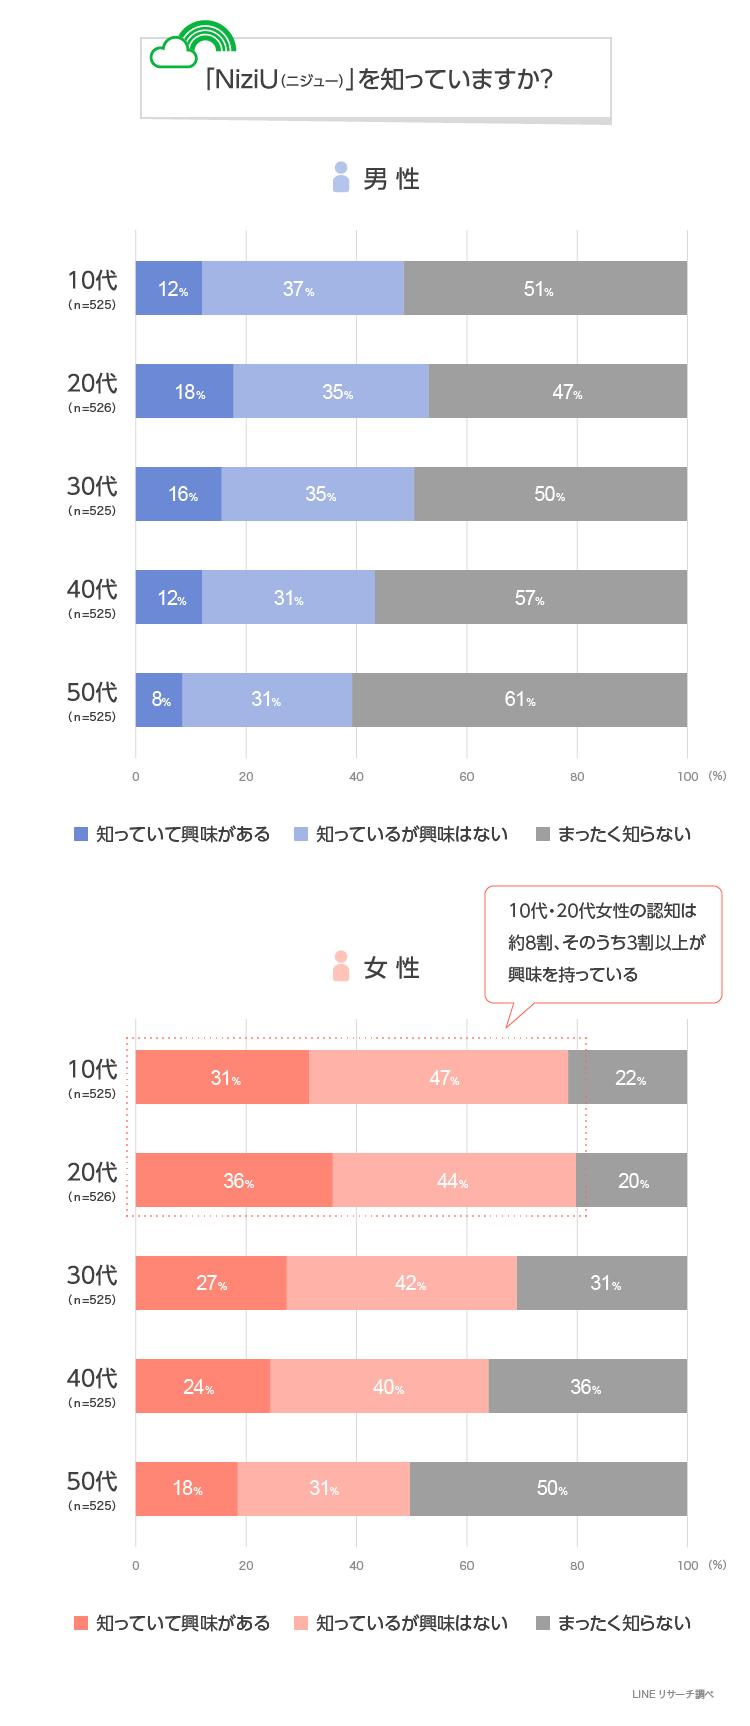 LINEリサーチ】全体の約5割が「NiziU」を知っていると回答、特に女性の ...